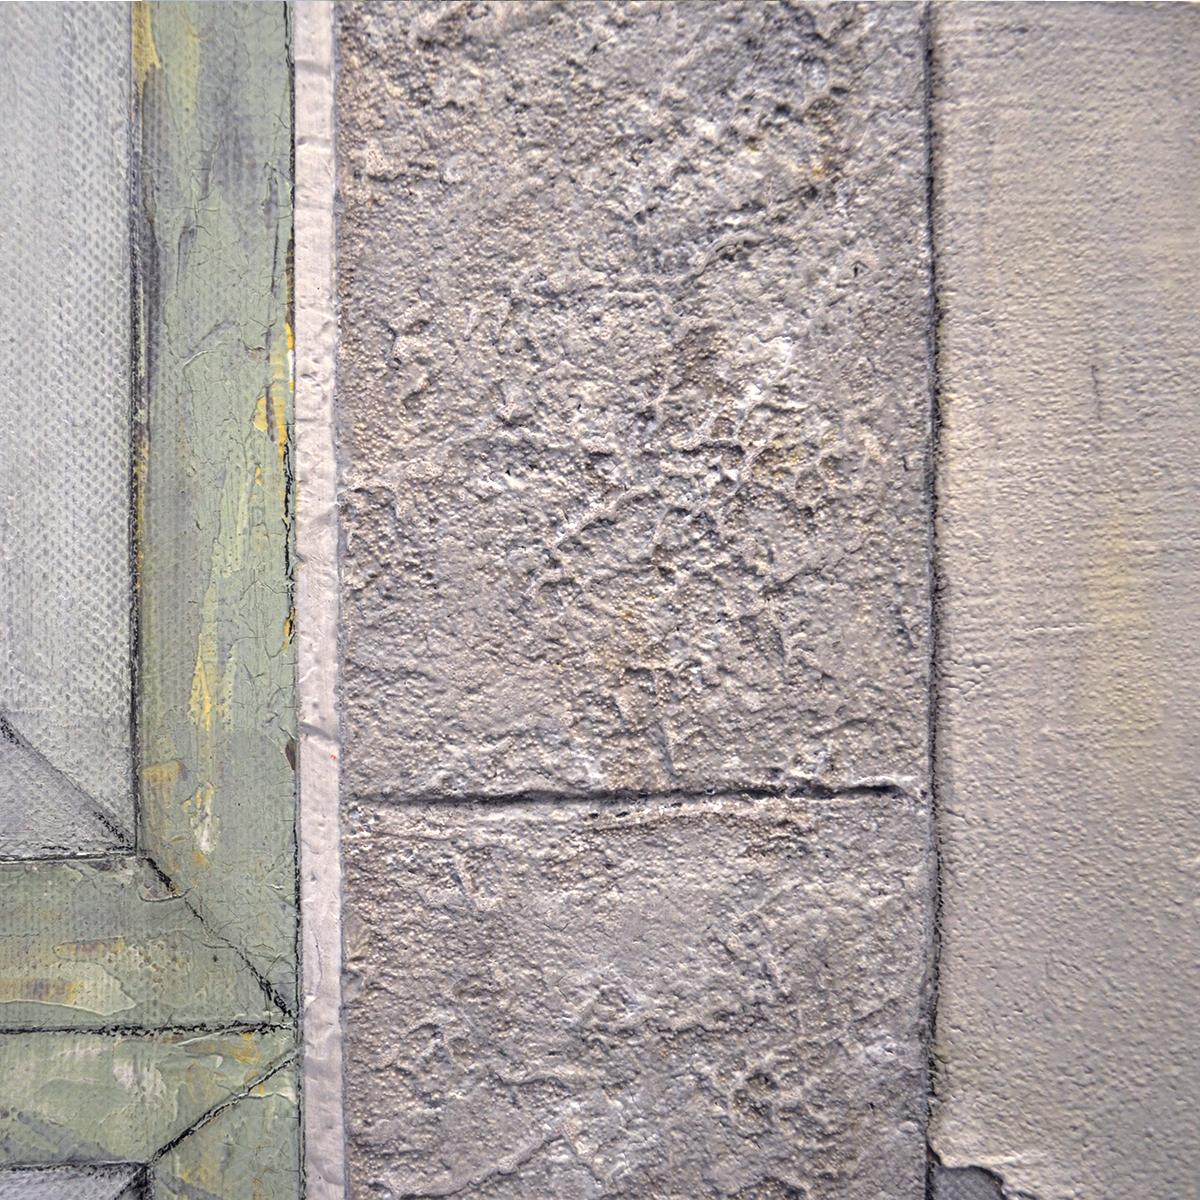 betonpasta close up